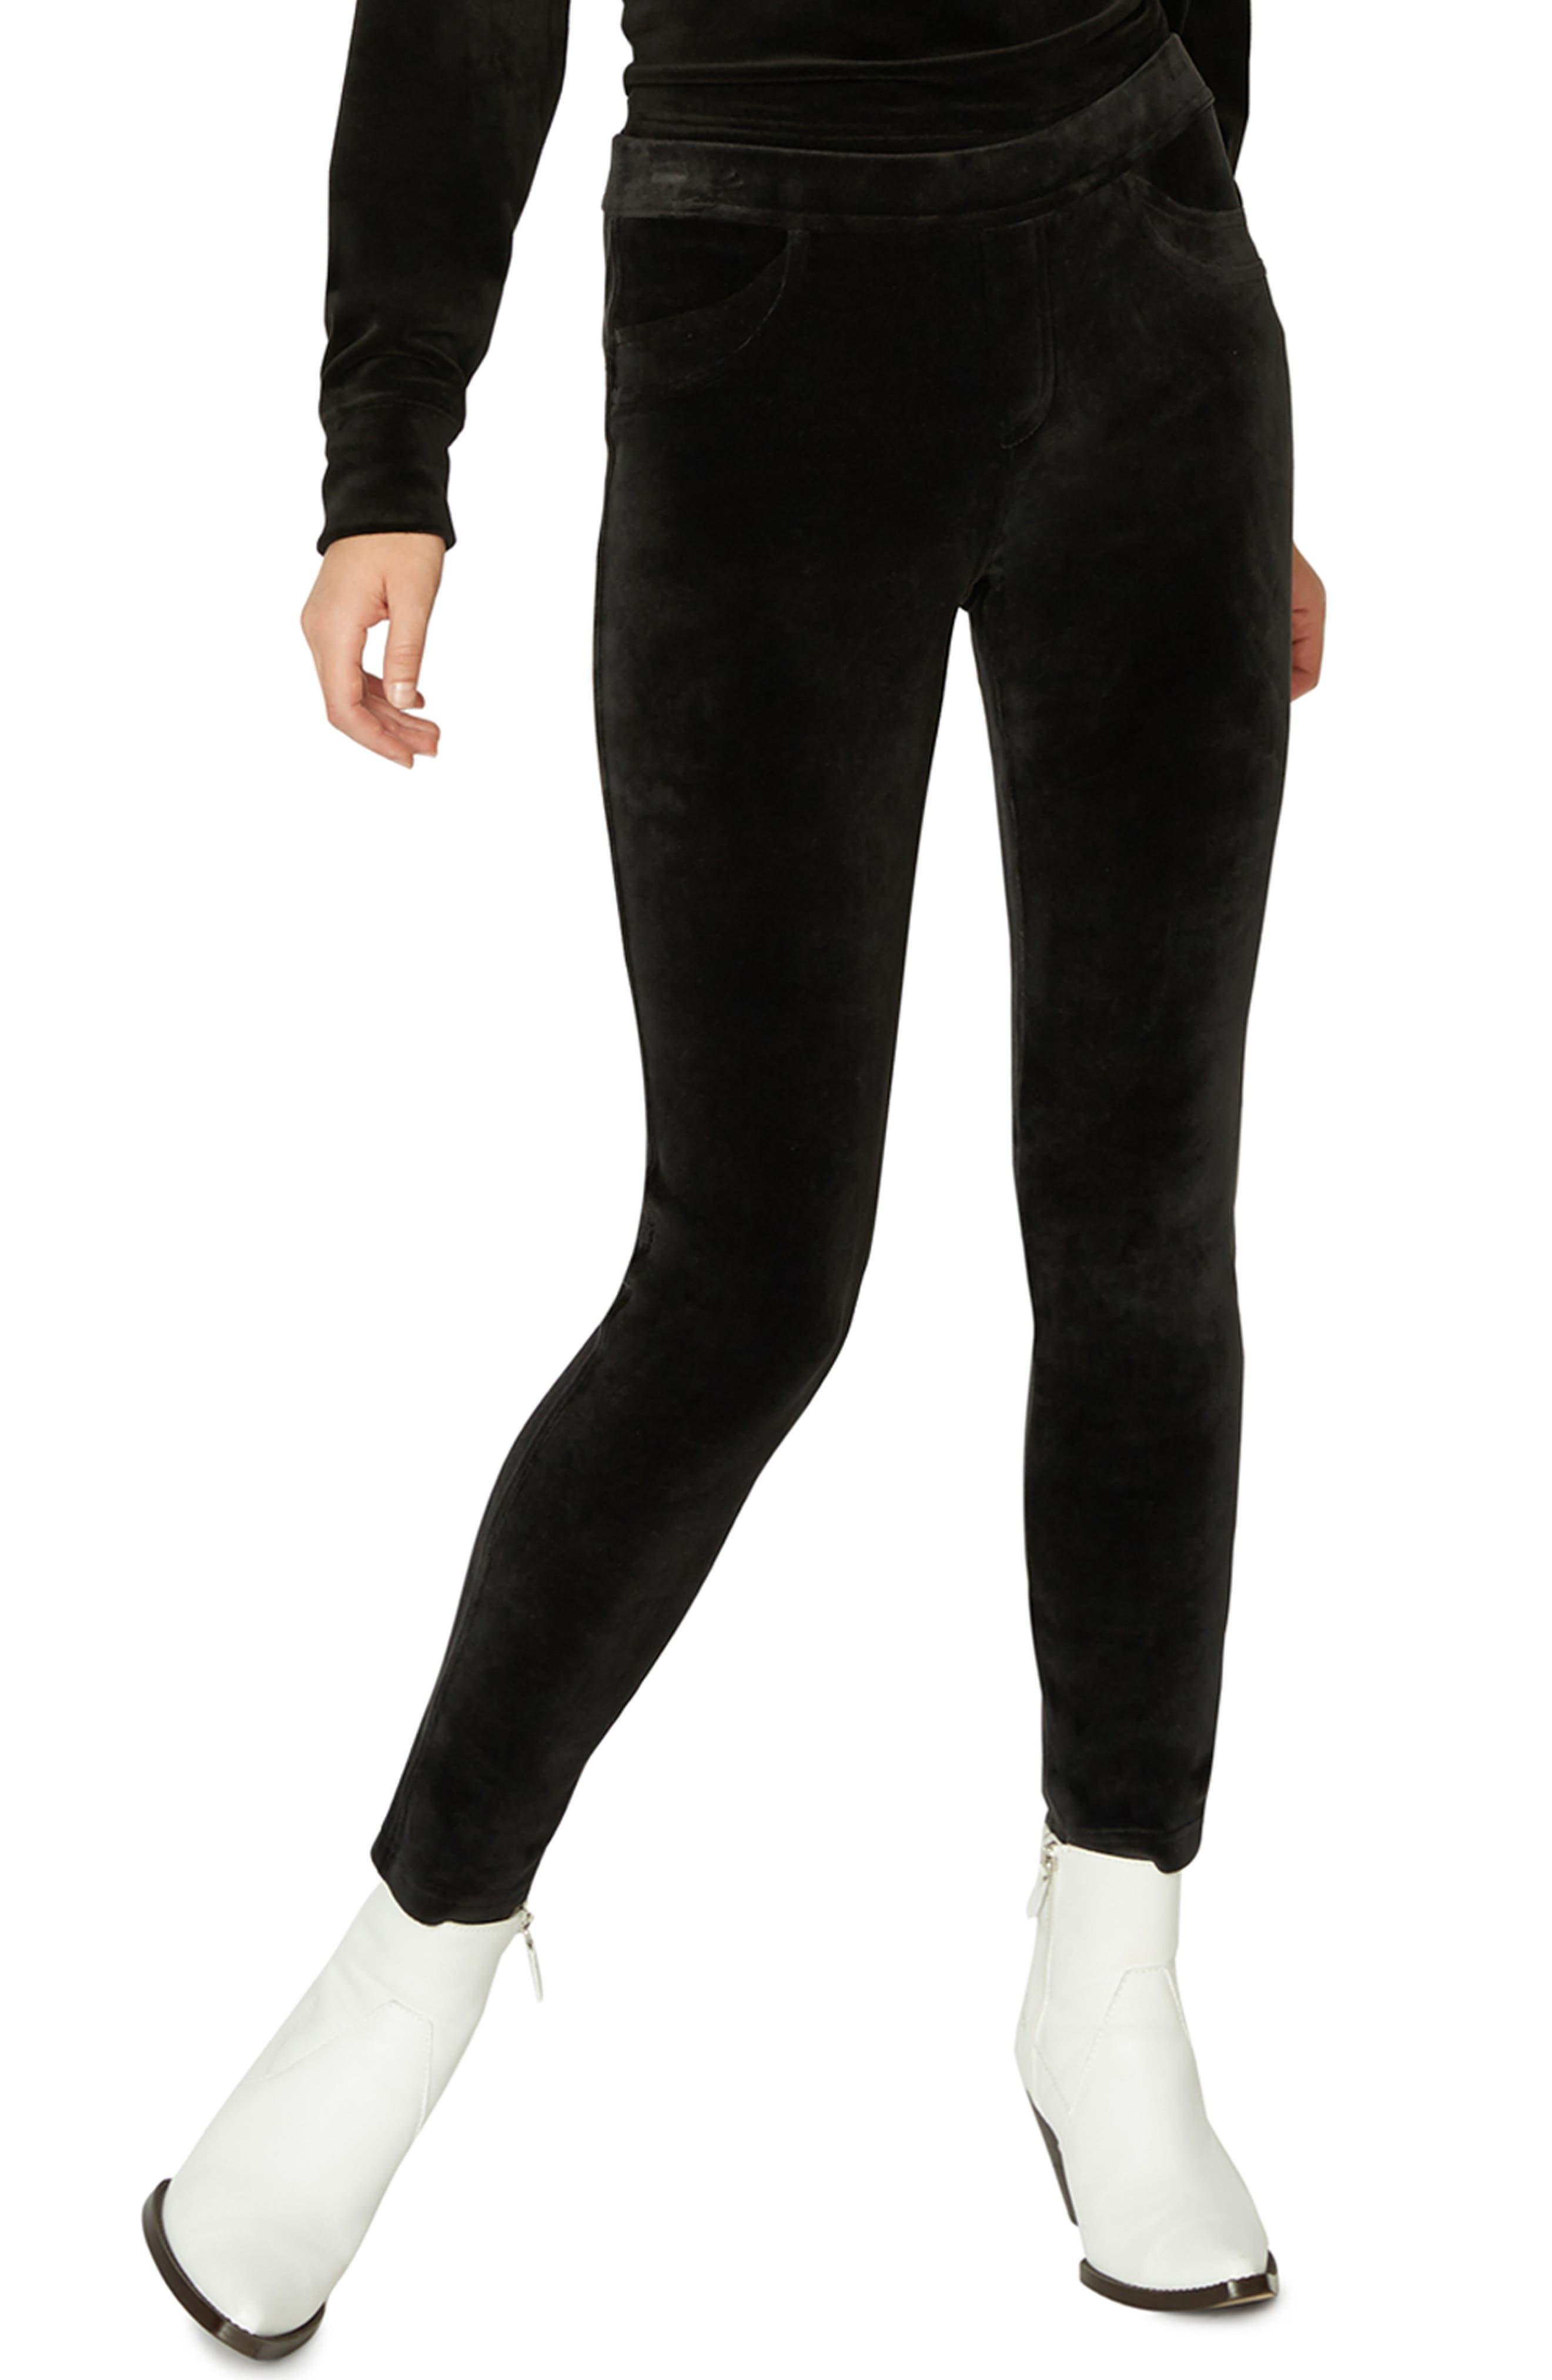 SANCTUARY Velour Grease Leggings, Main, color, 001